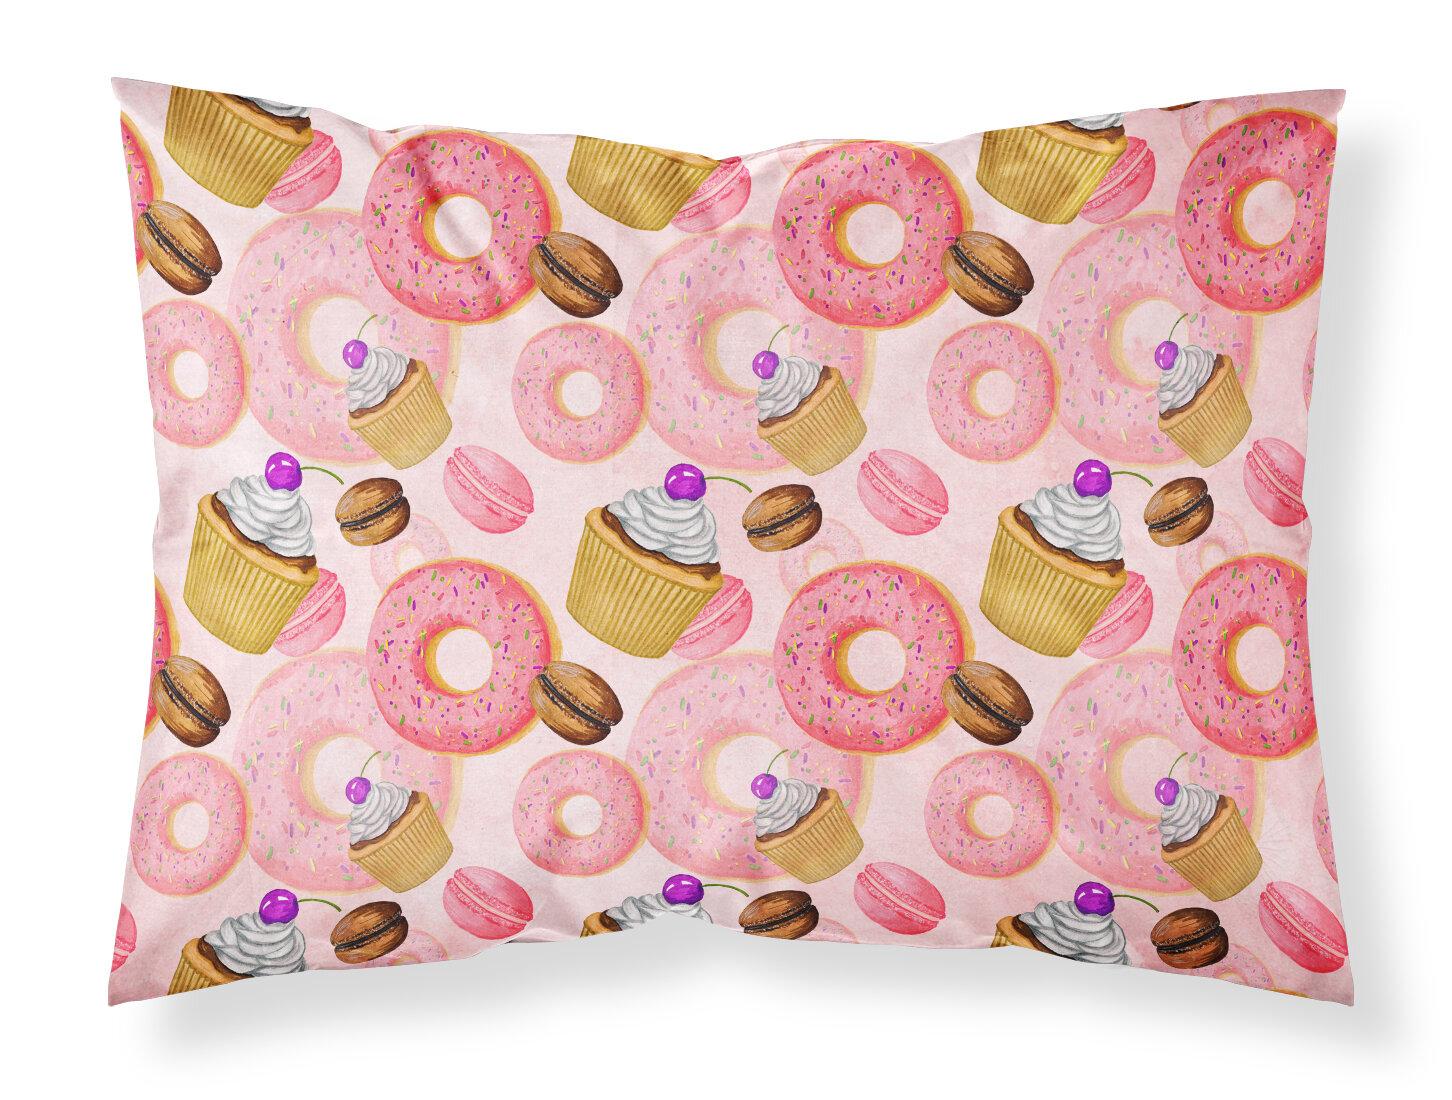 East Urban Home Watercolor Sweet Pastries Pillowcase Wayfair